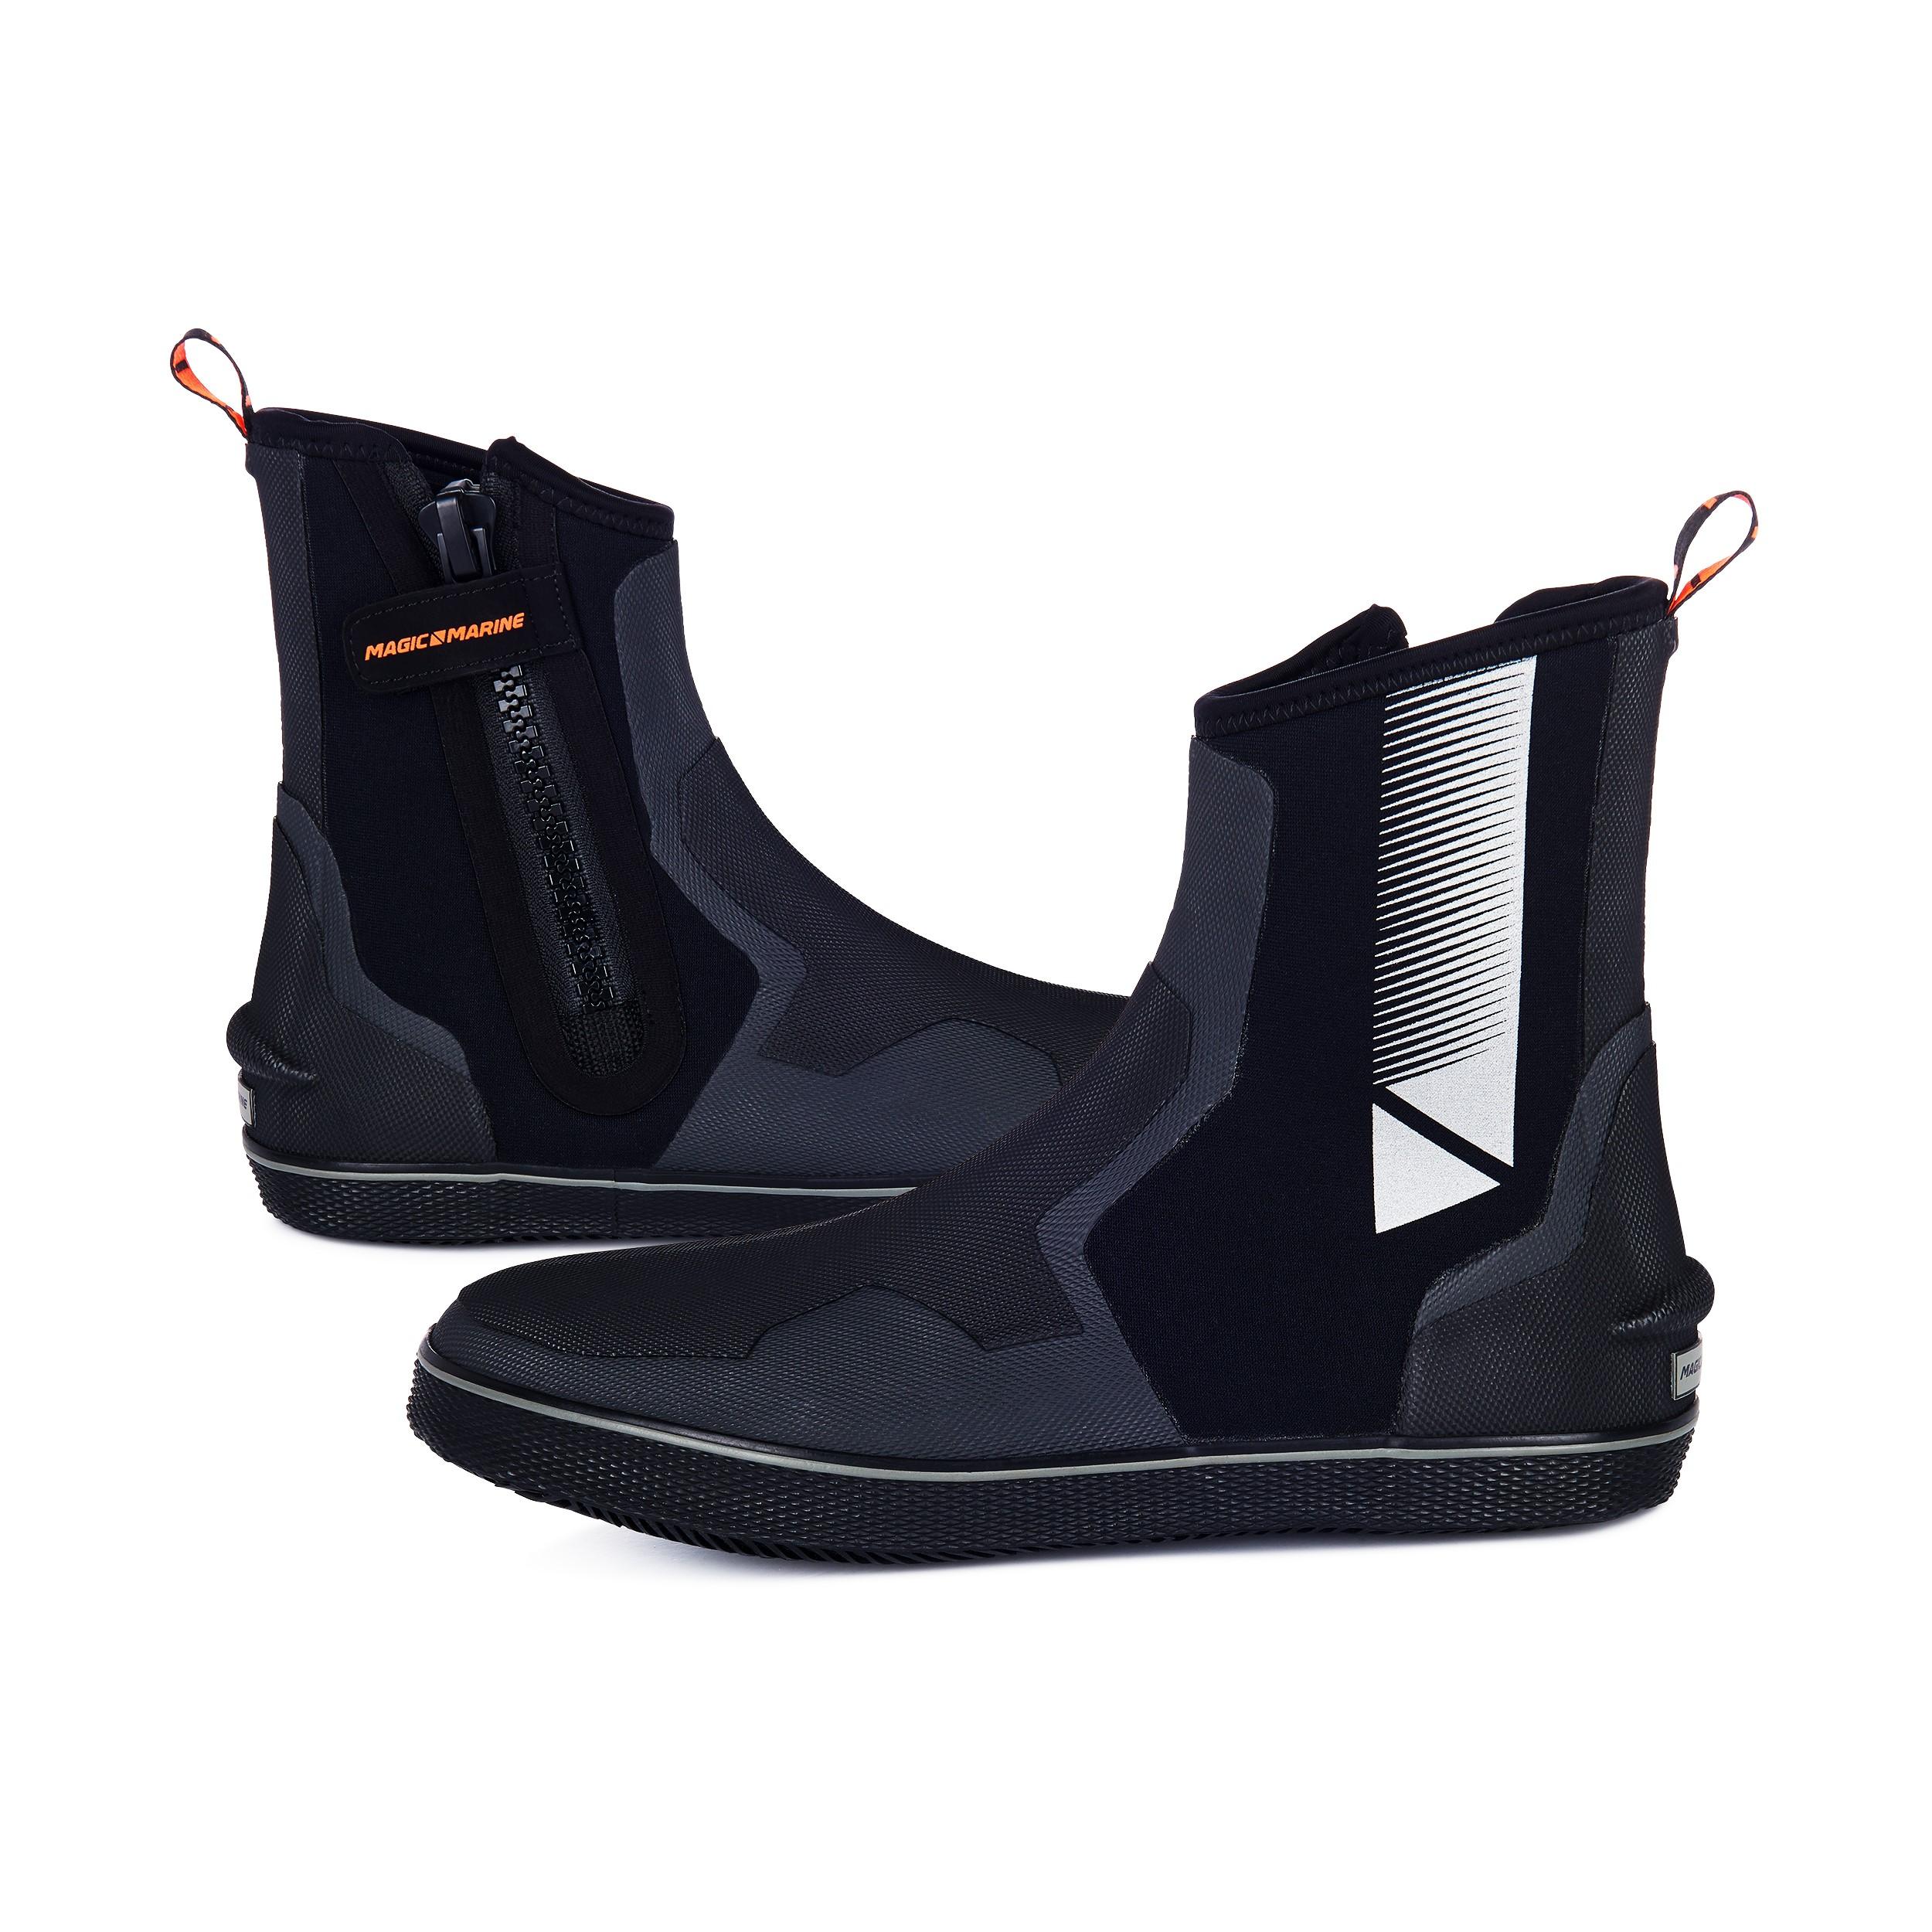 Magic Marine Frost Neopren Winter Segelhandschuhe 2018 Handschuhe Bootsport